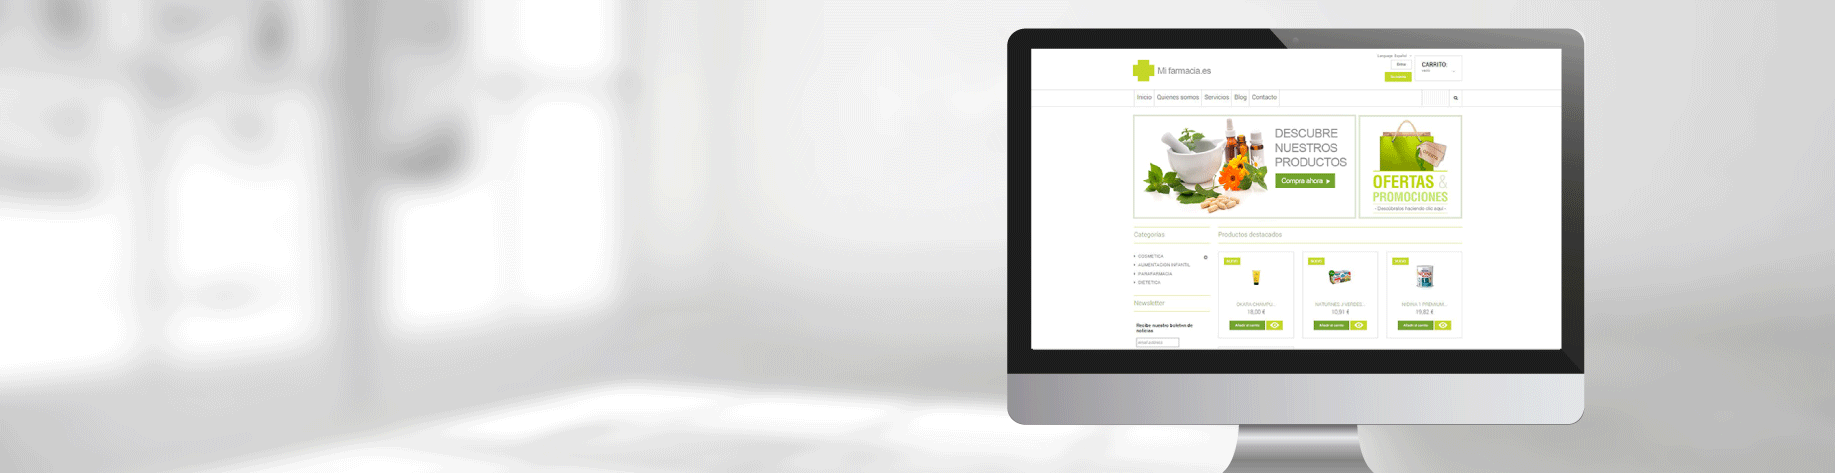 tienda-online-web-qmarketing